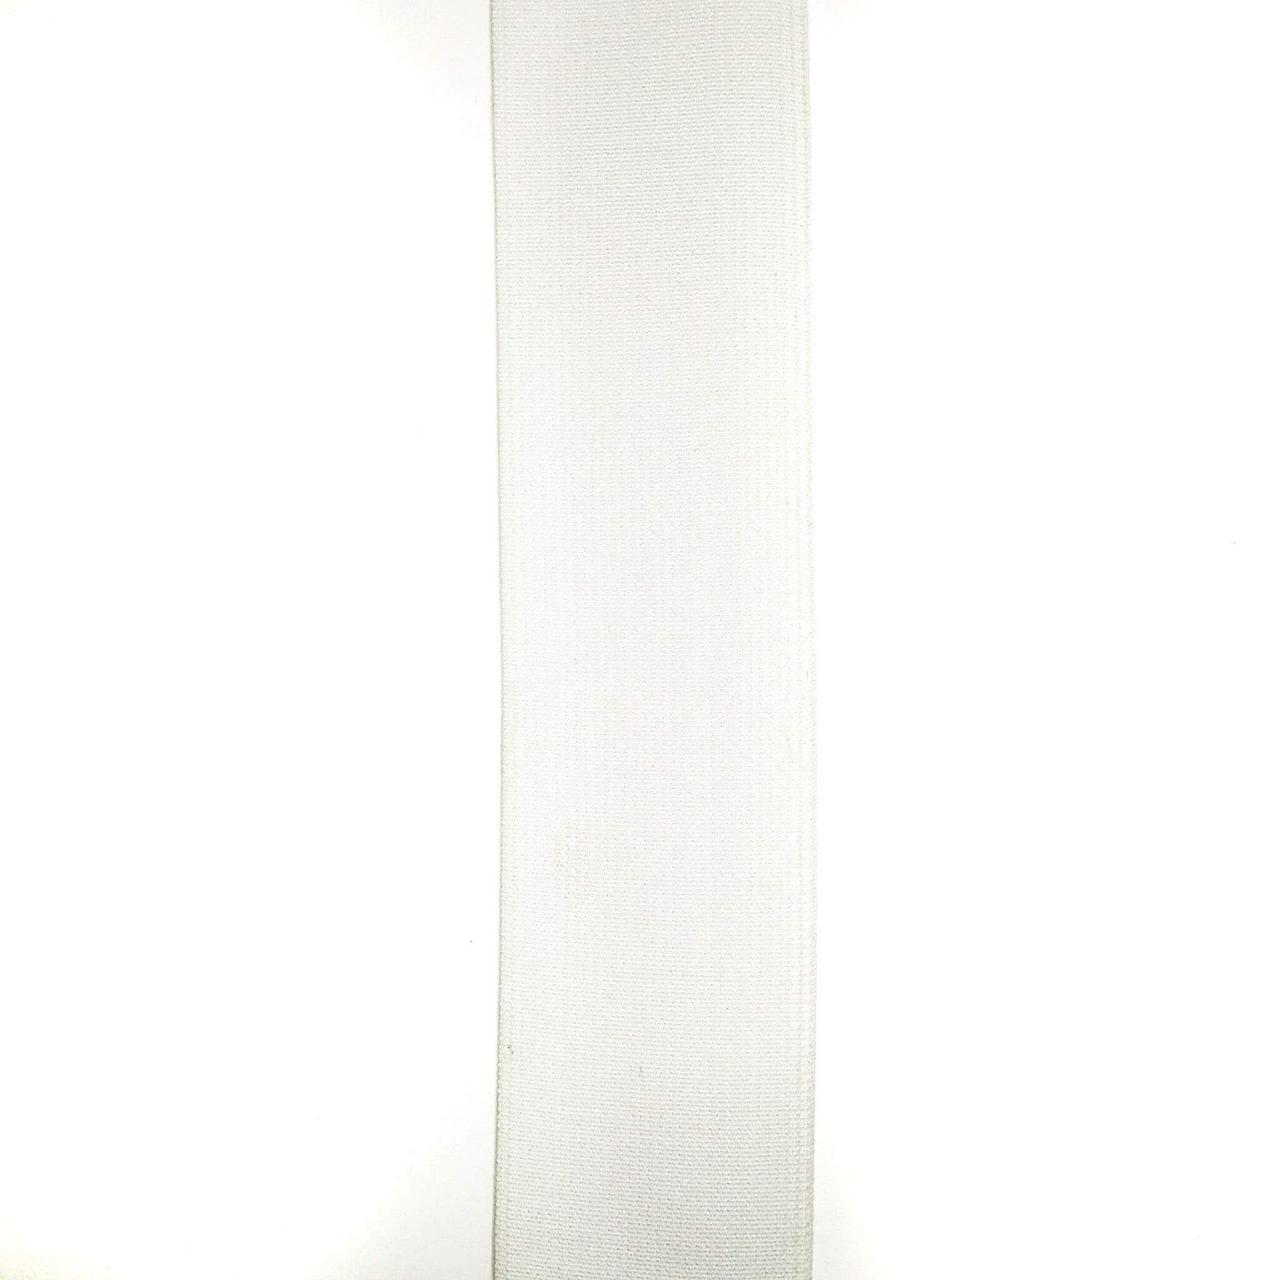 Стрічка еластична 40 мм (50м/рулон)